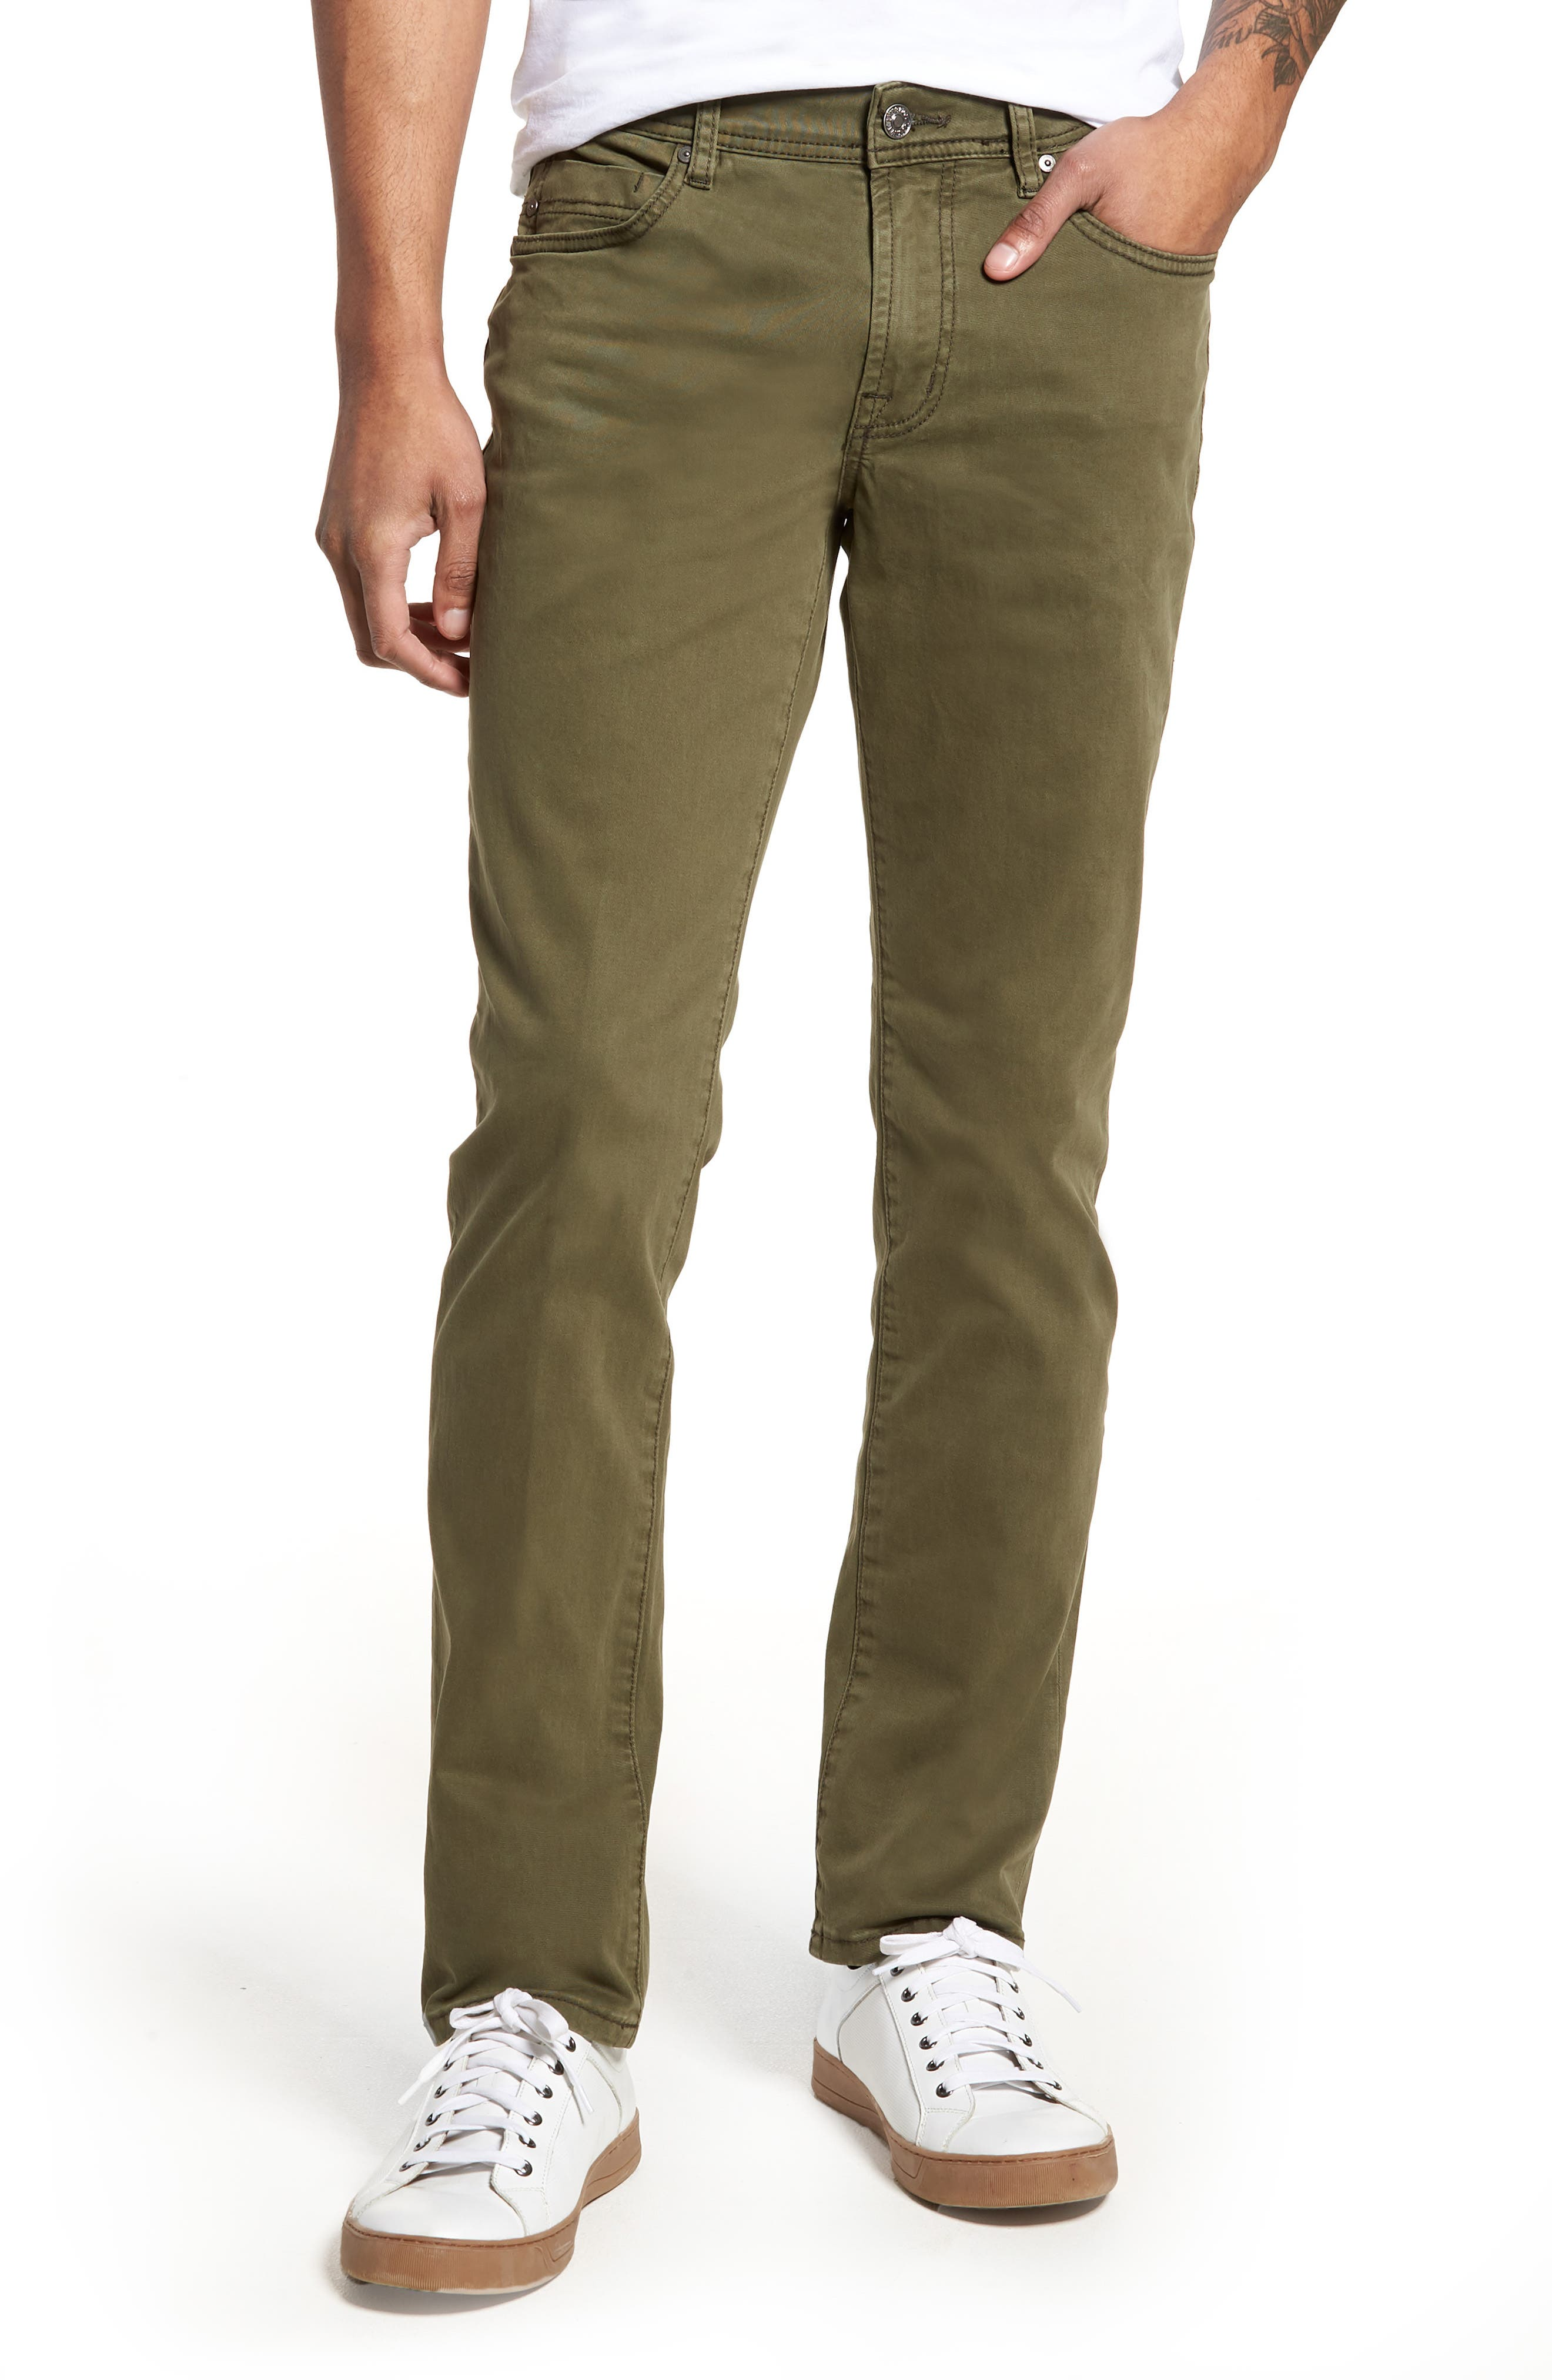 Jeans Co. Kingston Slim Straight Leg Jeans,                         Main,                         color, Olive Night